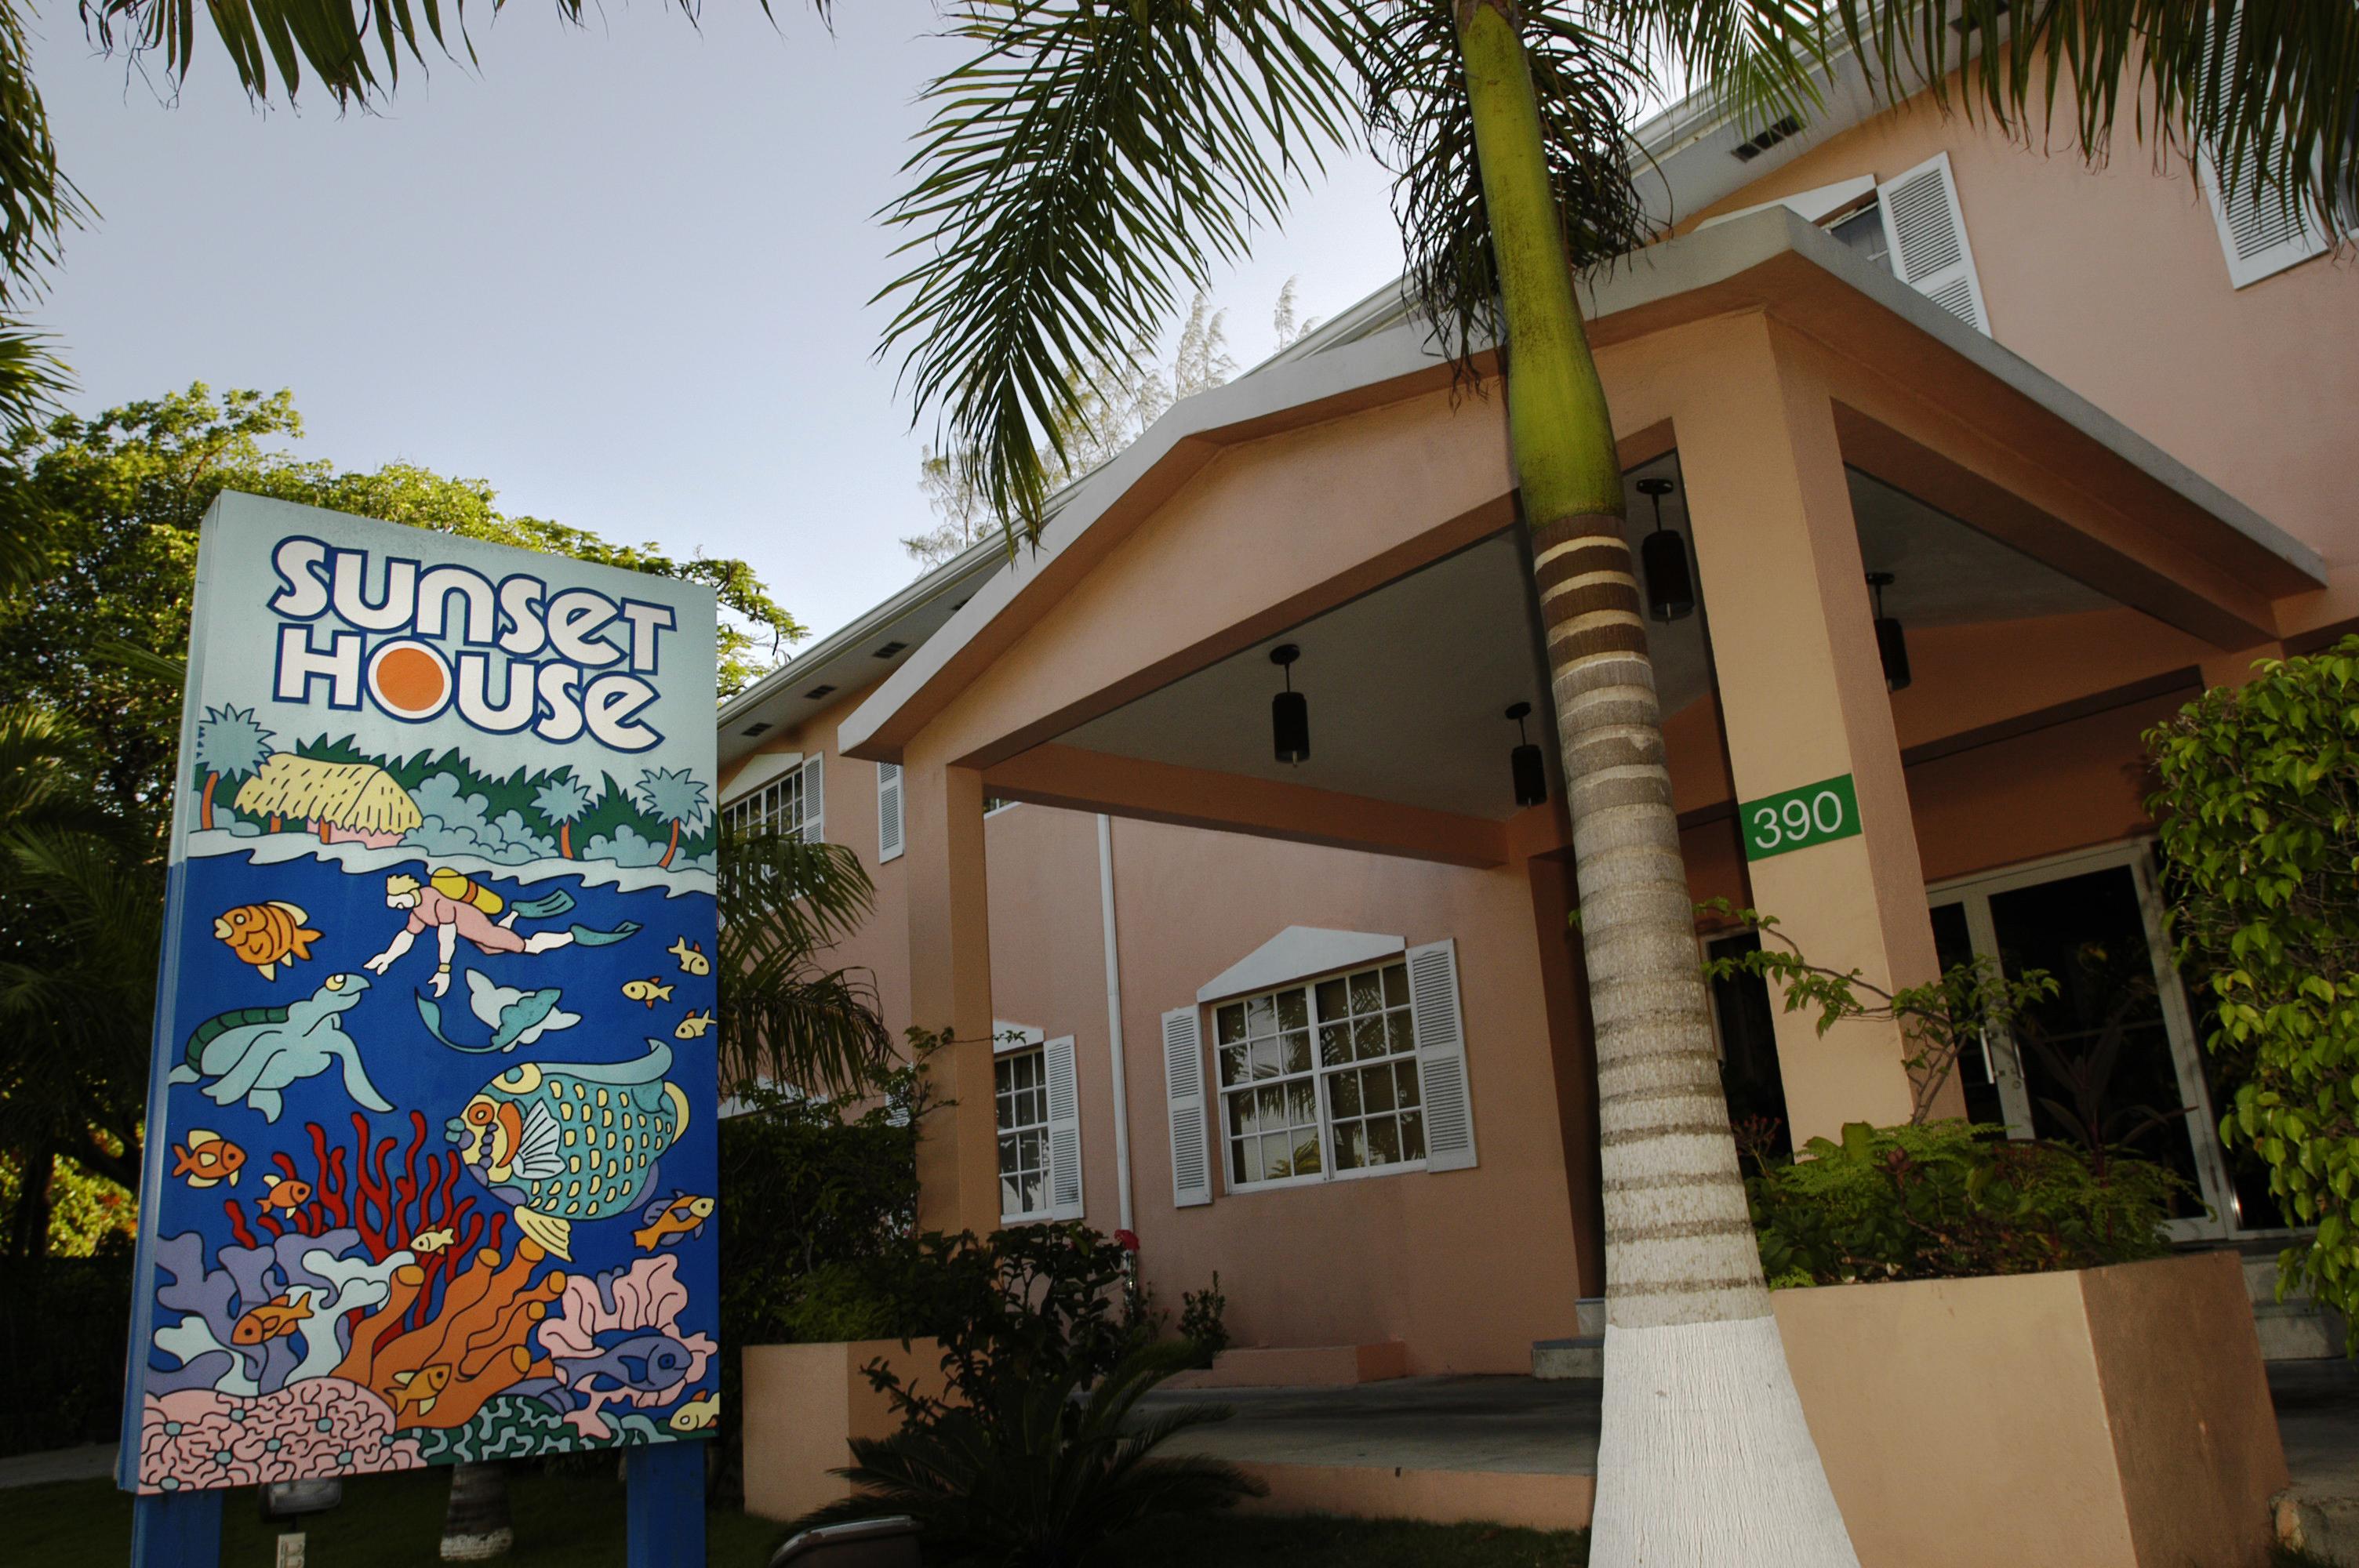 Grand Cayman Island Sunset House